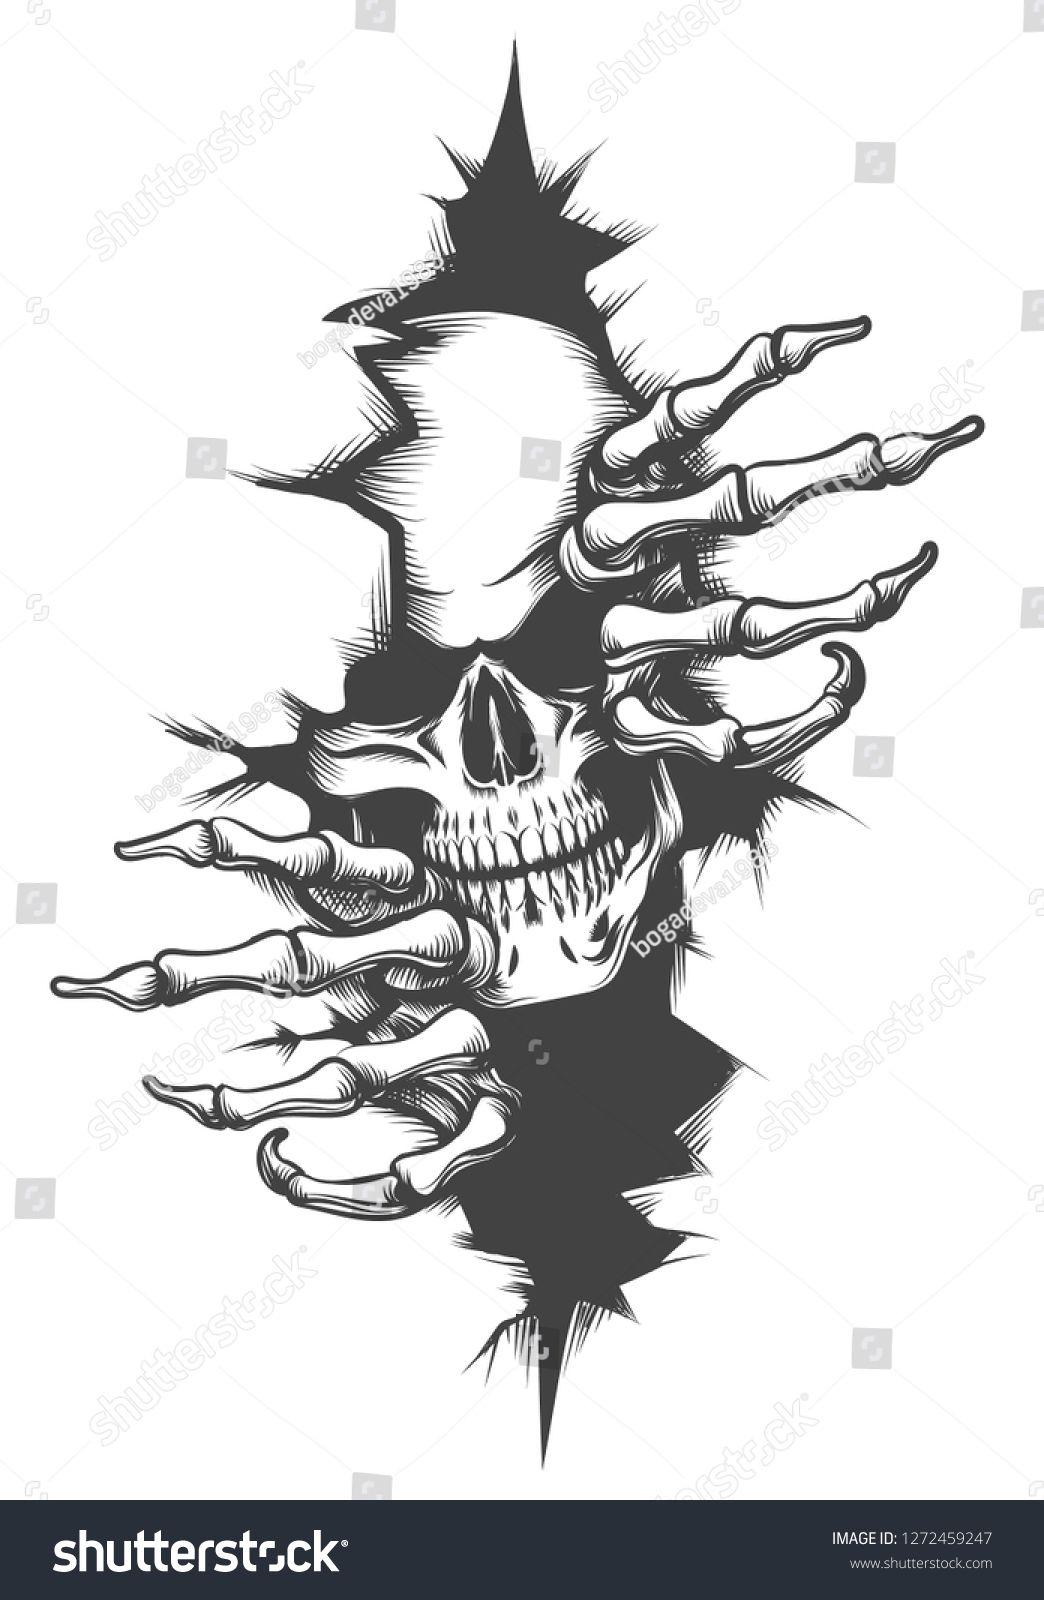 Human Skull Peeping Through Hole Drawn Stock Illustration 1272459247